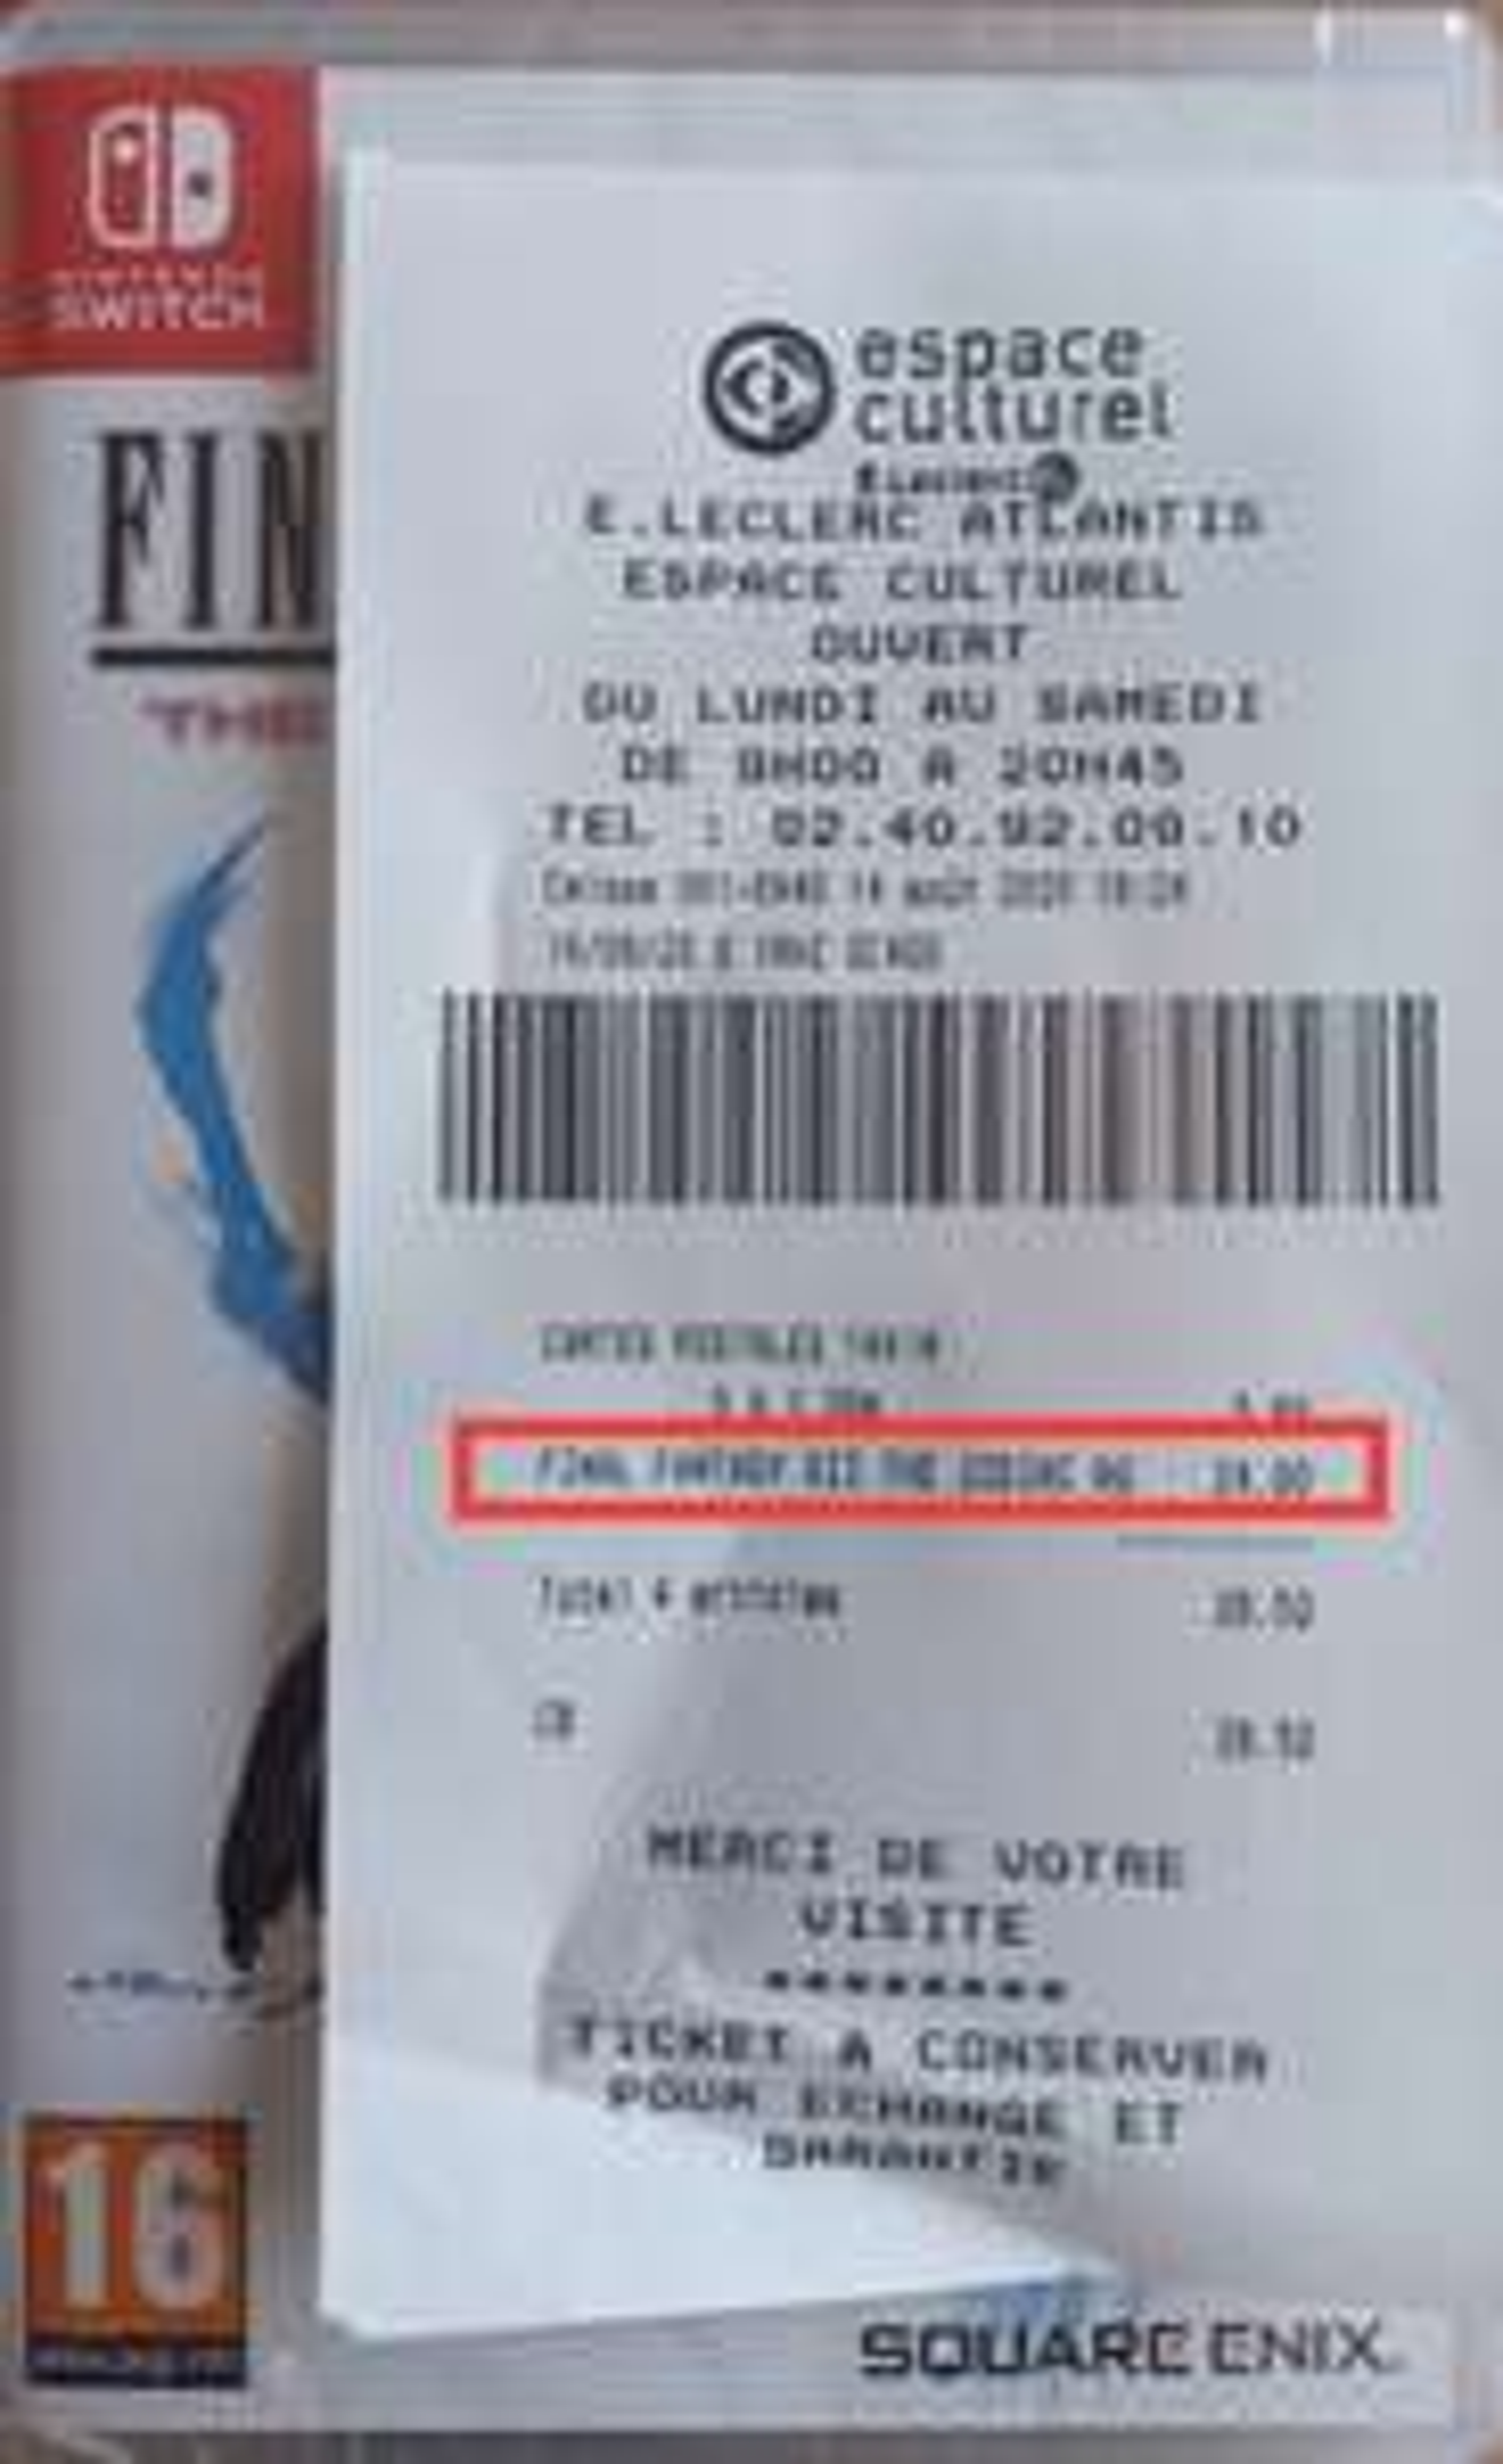 Final Fantasy XII sur Nintendo Switch - Saint-Herblain (44)